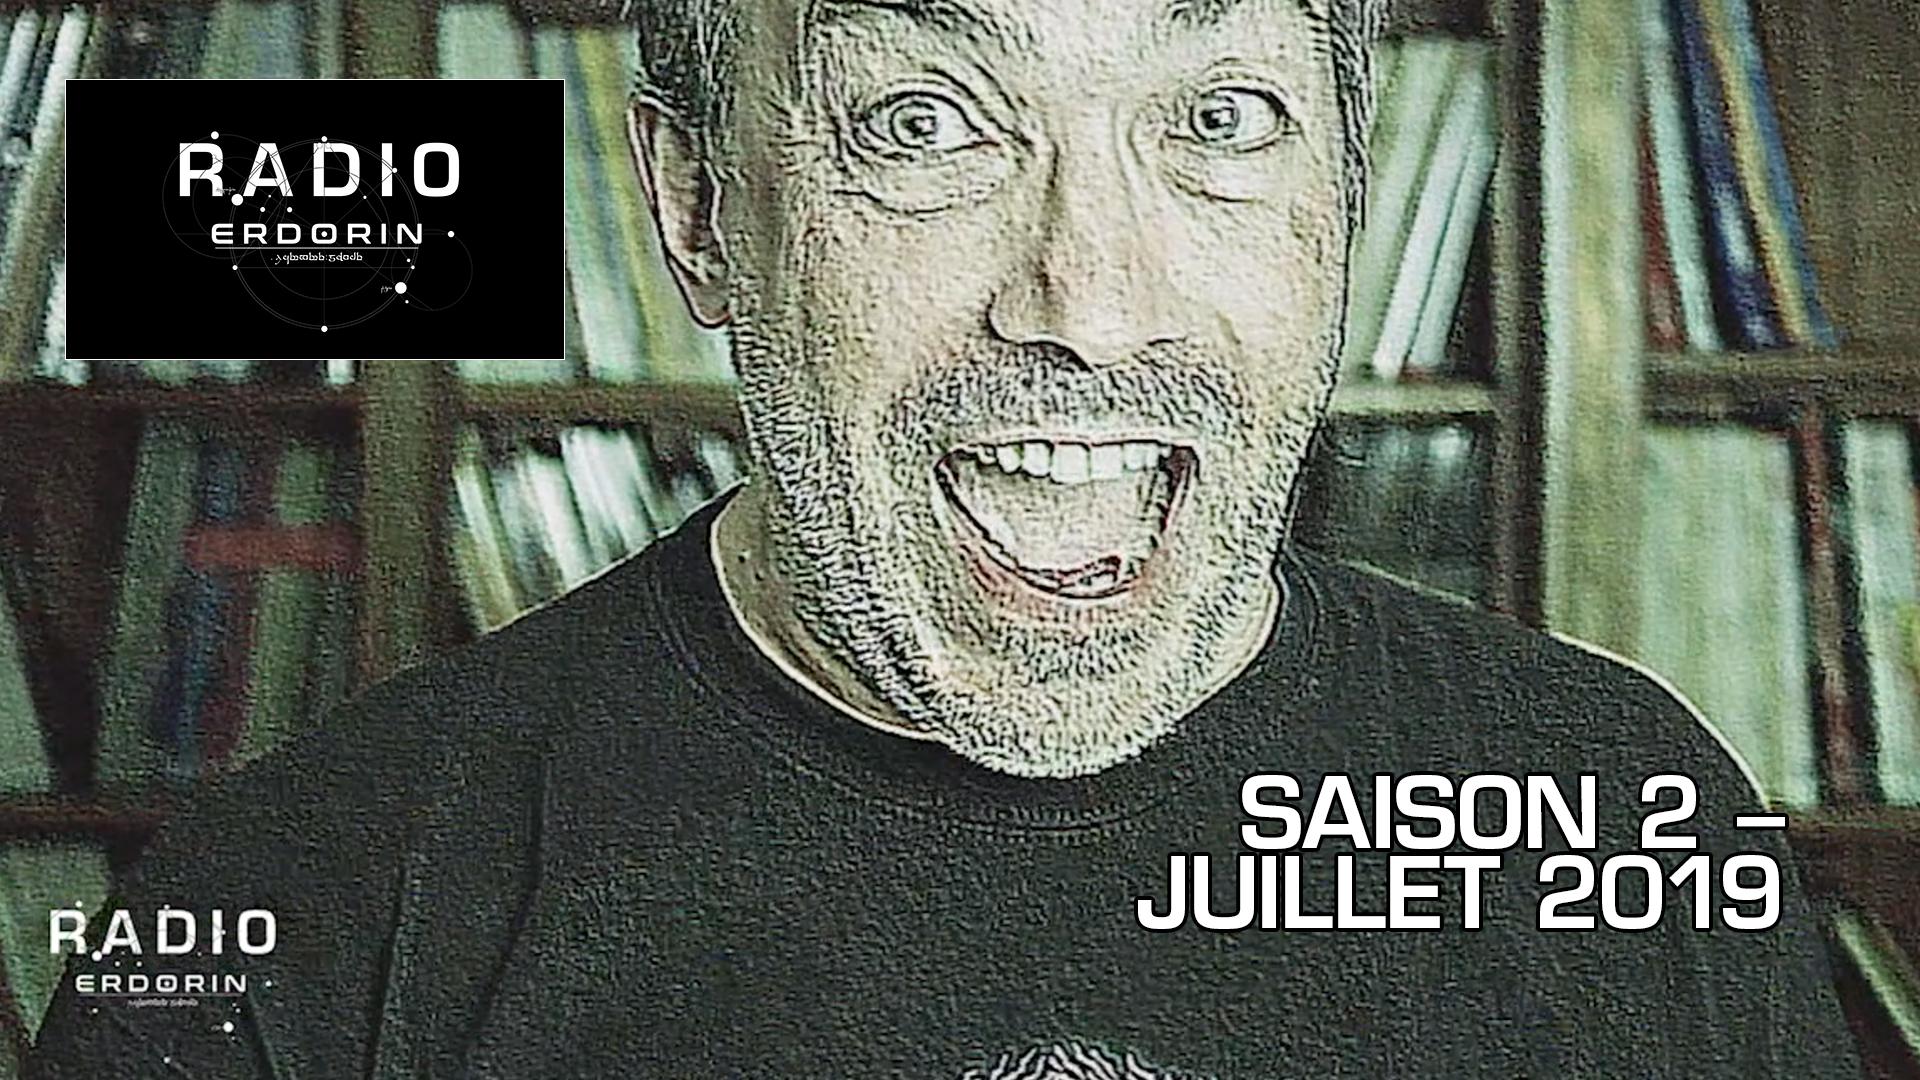 Radio-Erdorin S2E7 – Juillet 2019